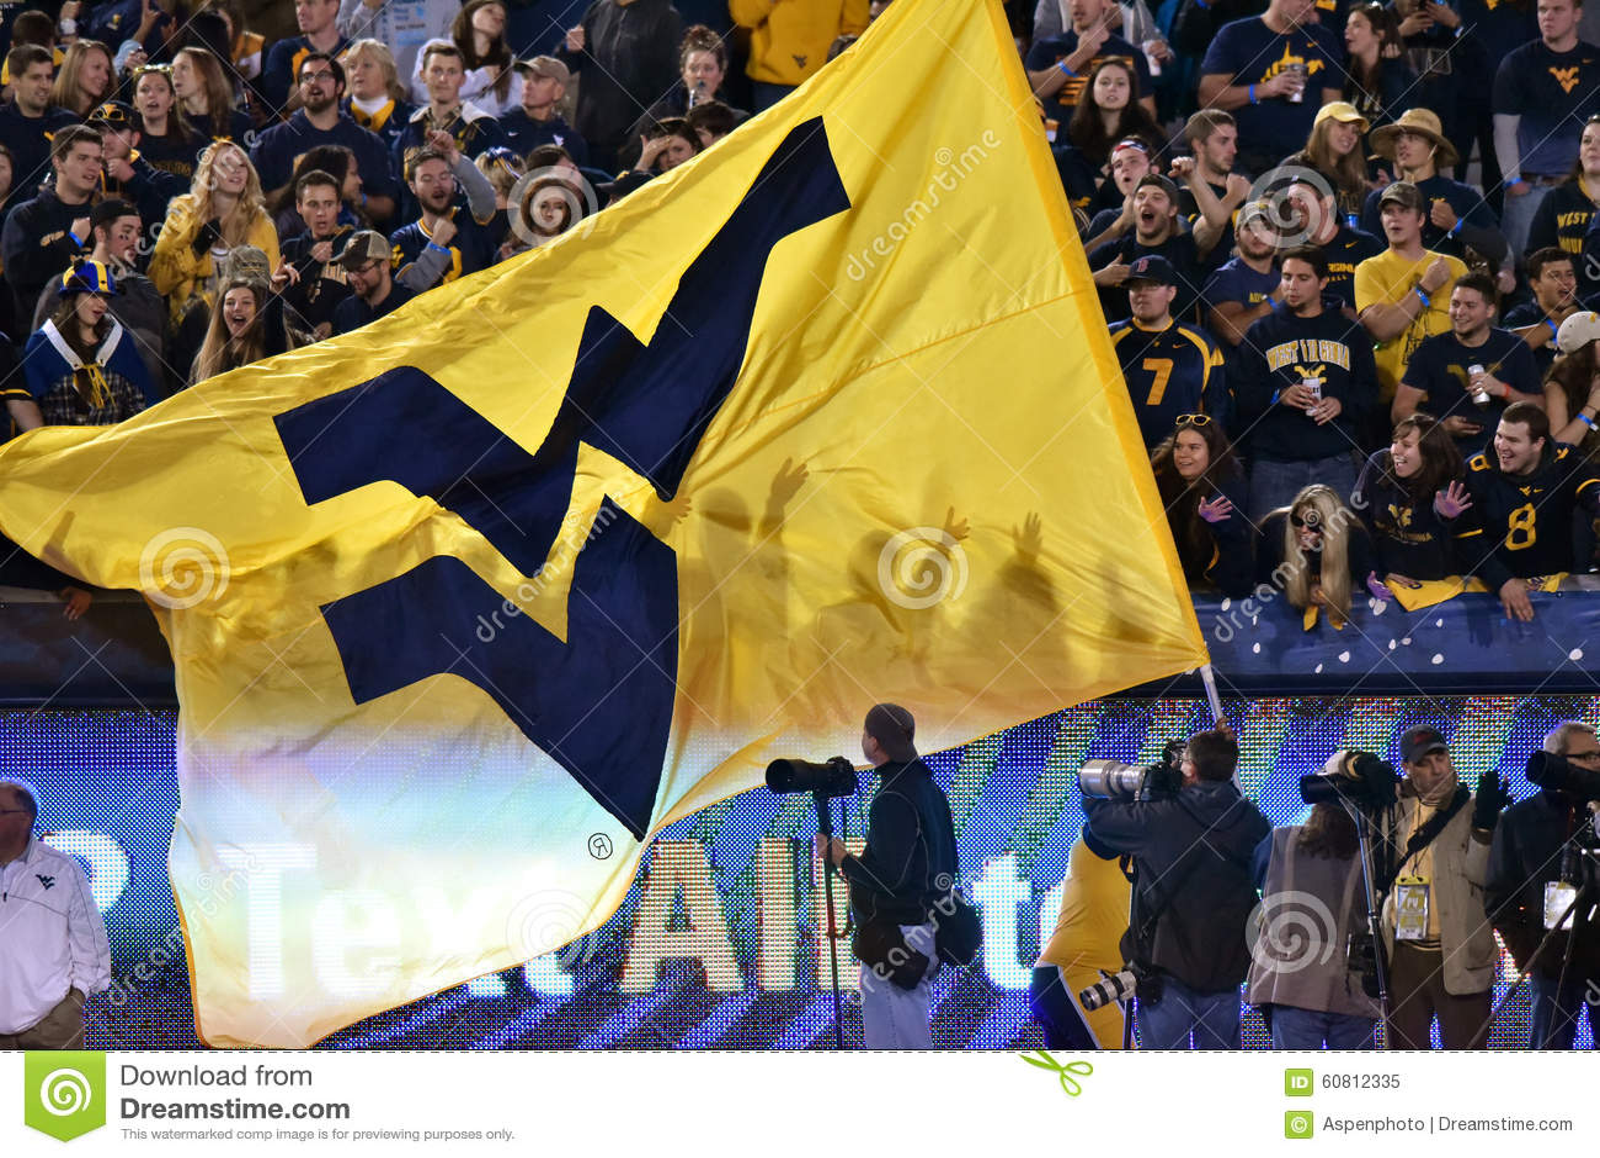 west virginia flag pregame at a football game editorial photo 21965045. Black Bedroom Furniture Sets. Home Design Ideas